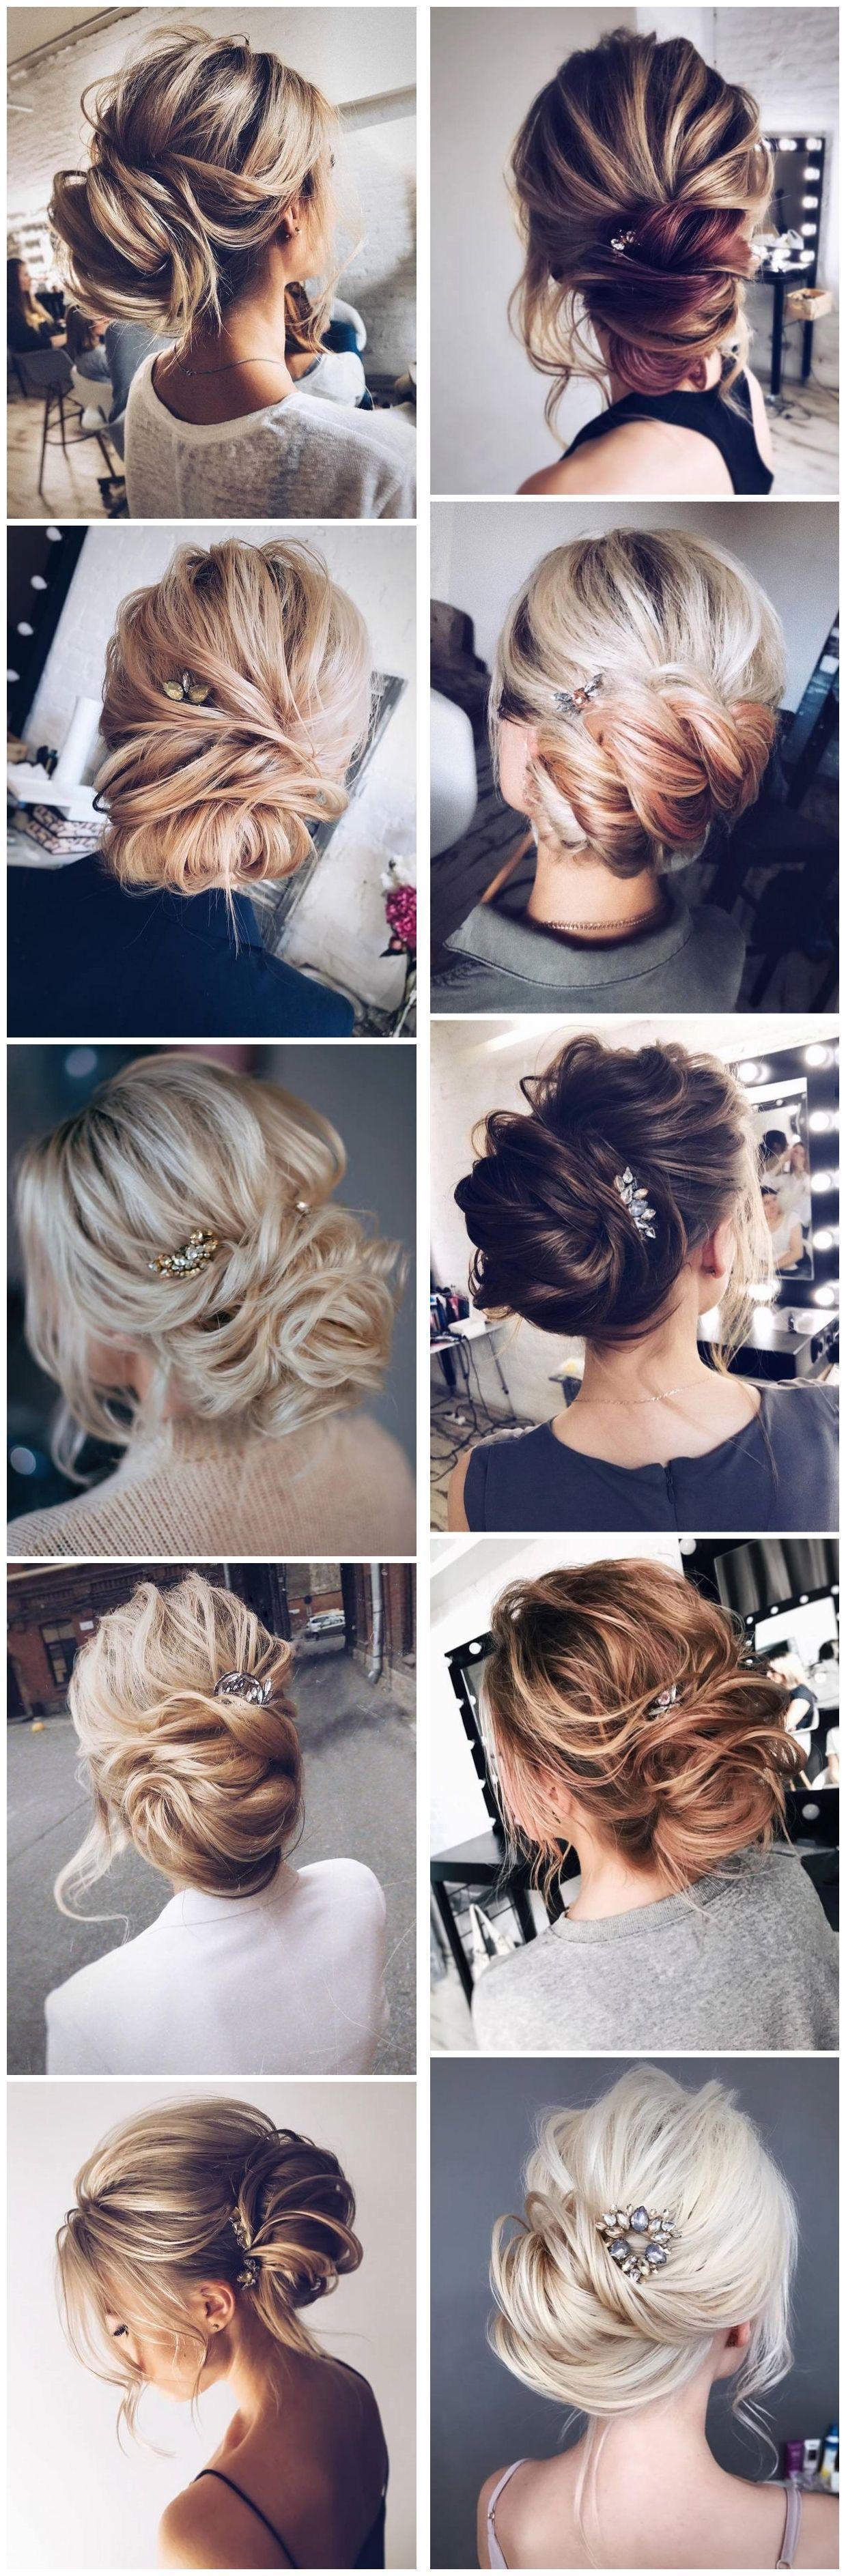 Tonyastylist wedding updo hairstyles for bride weddings updos